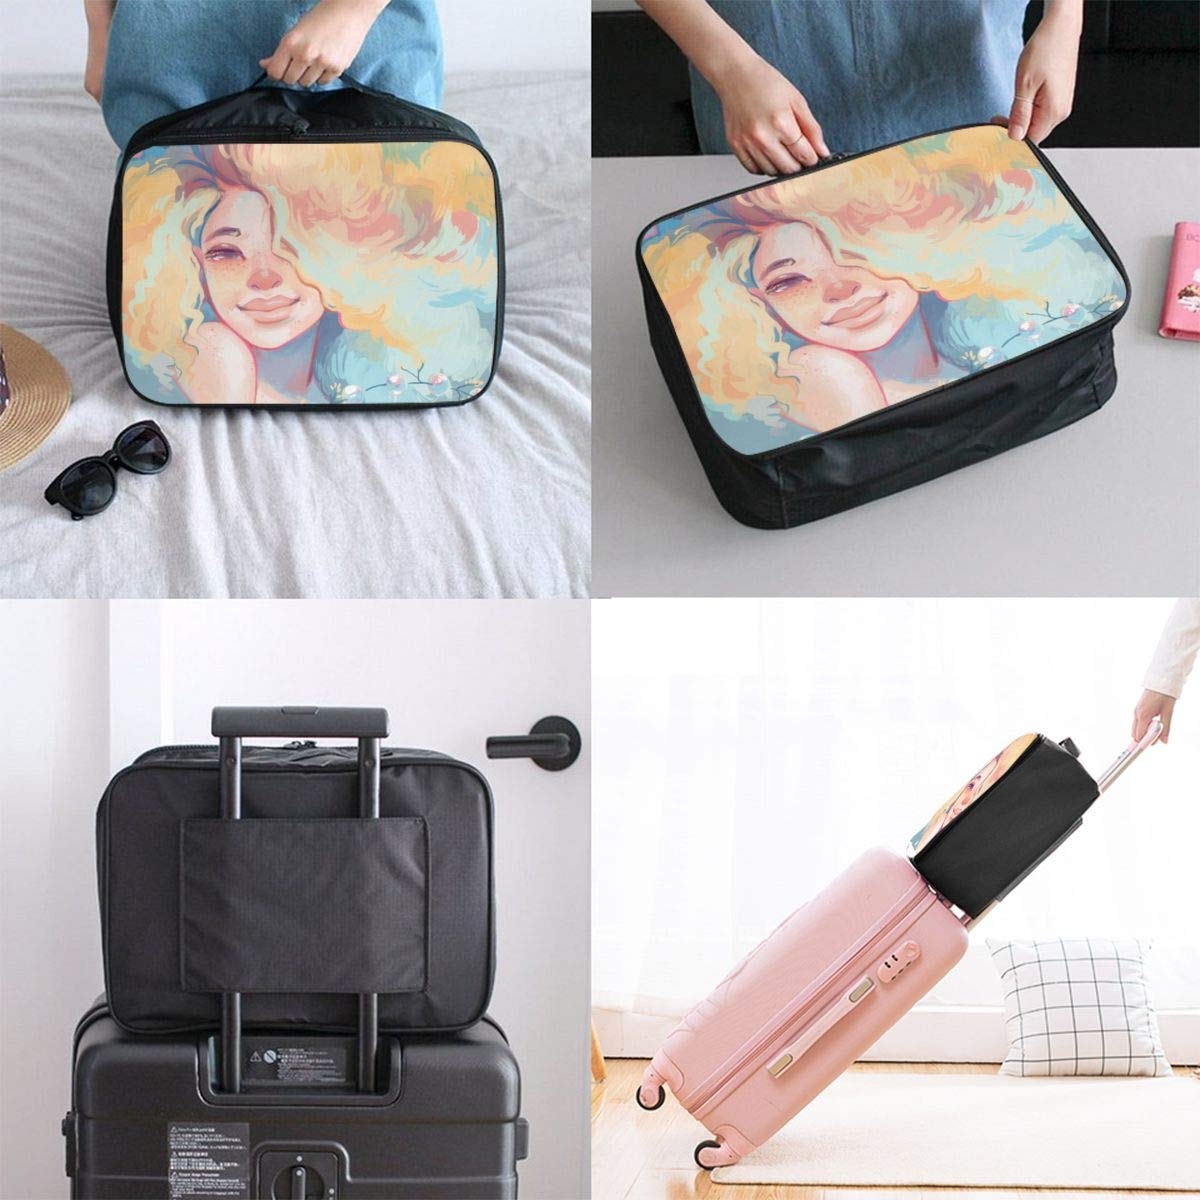 Lady American Black Women With Yellow Hair Travel Luggage Storage Bag Duffel Bag Handle Makeup Bag Fashion Lightweight Large Capacity Portable Luggage Bag